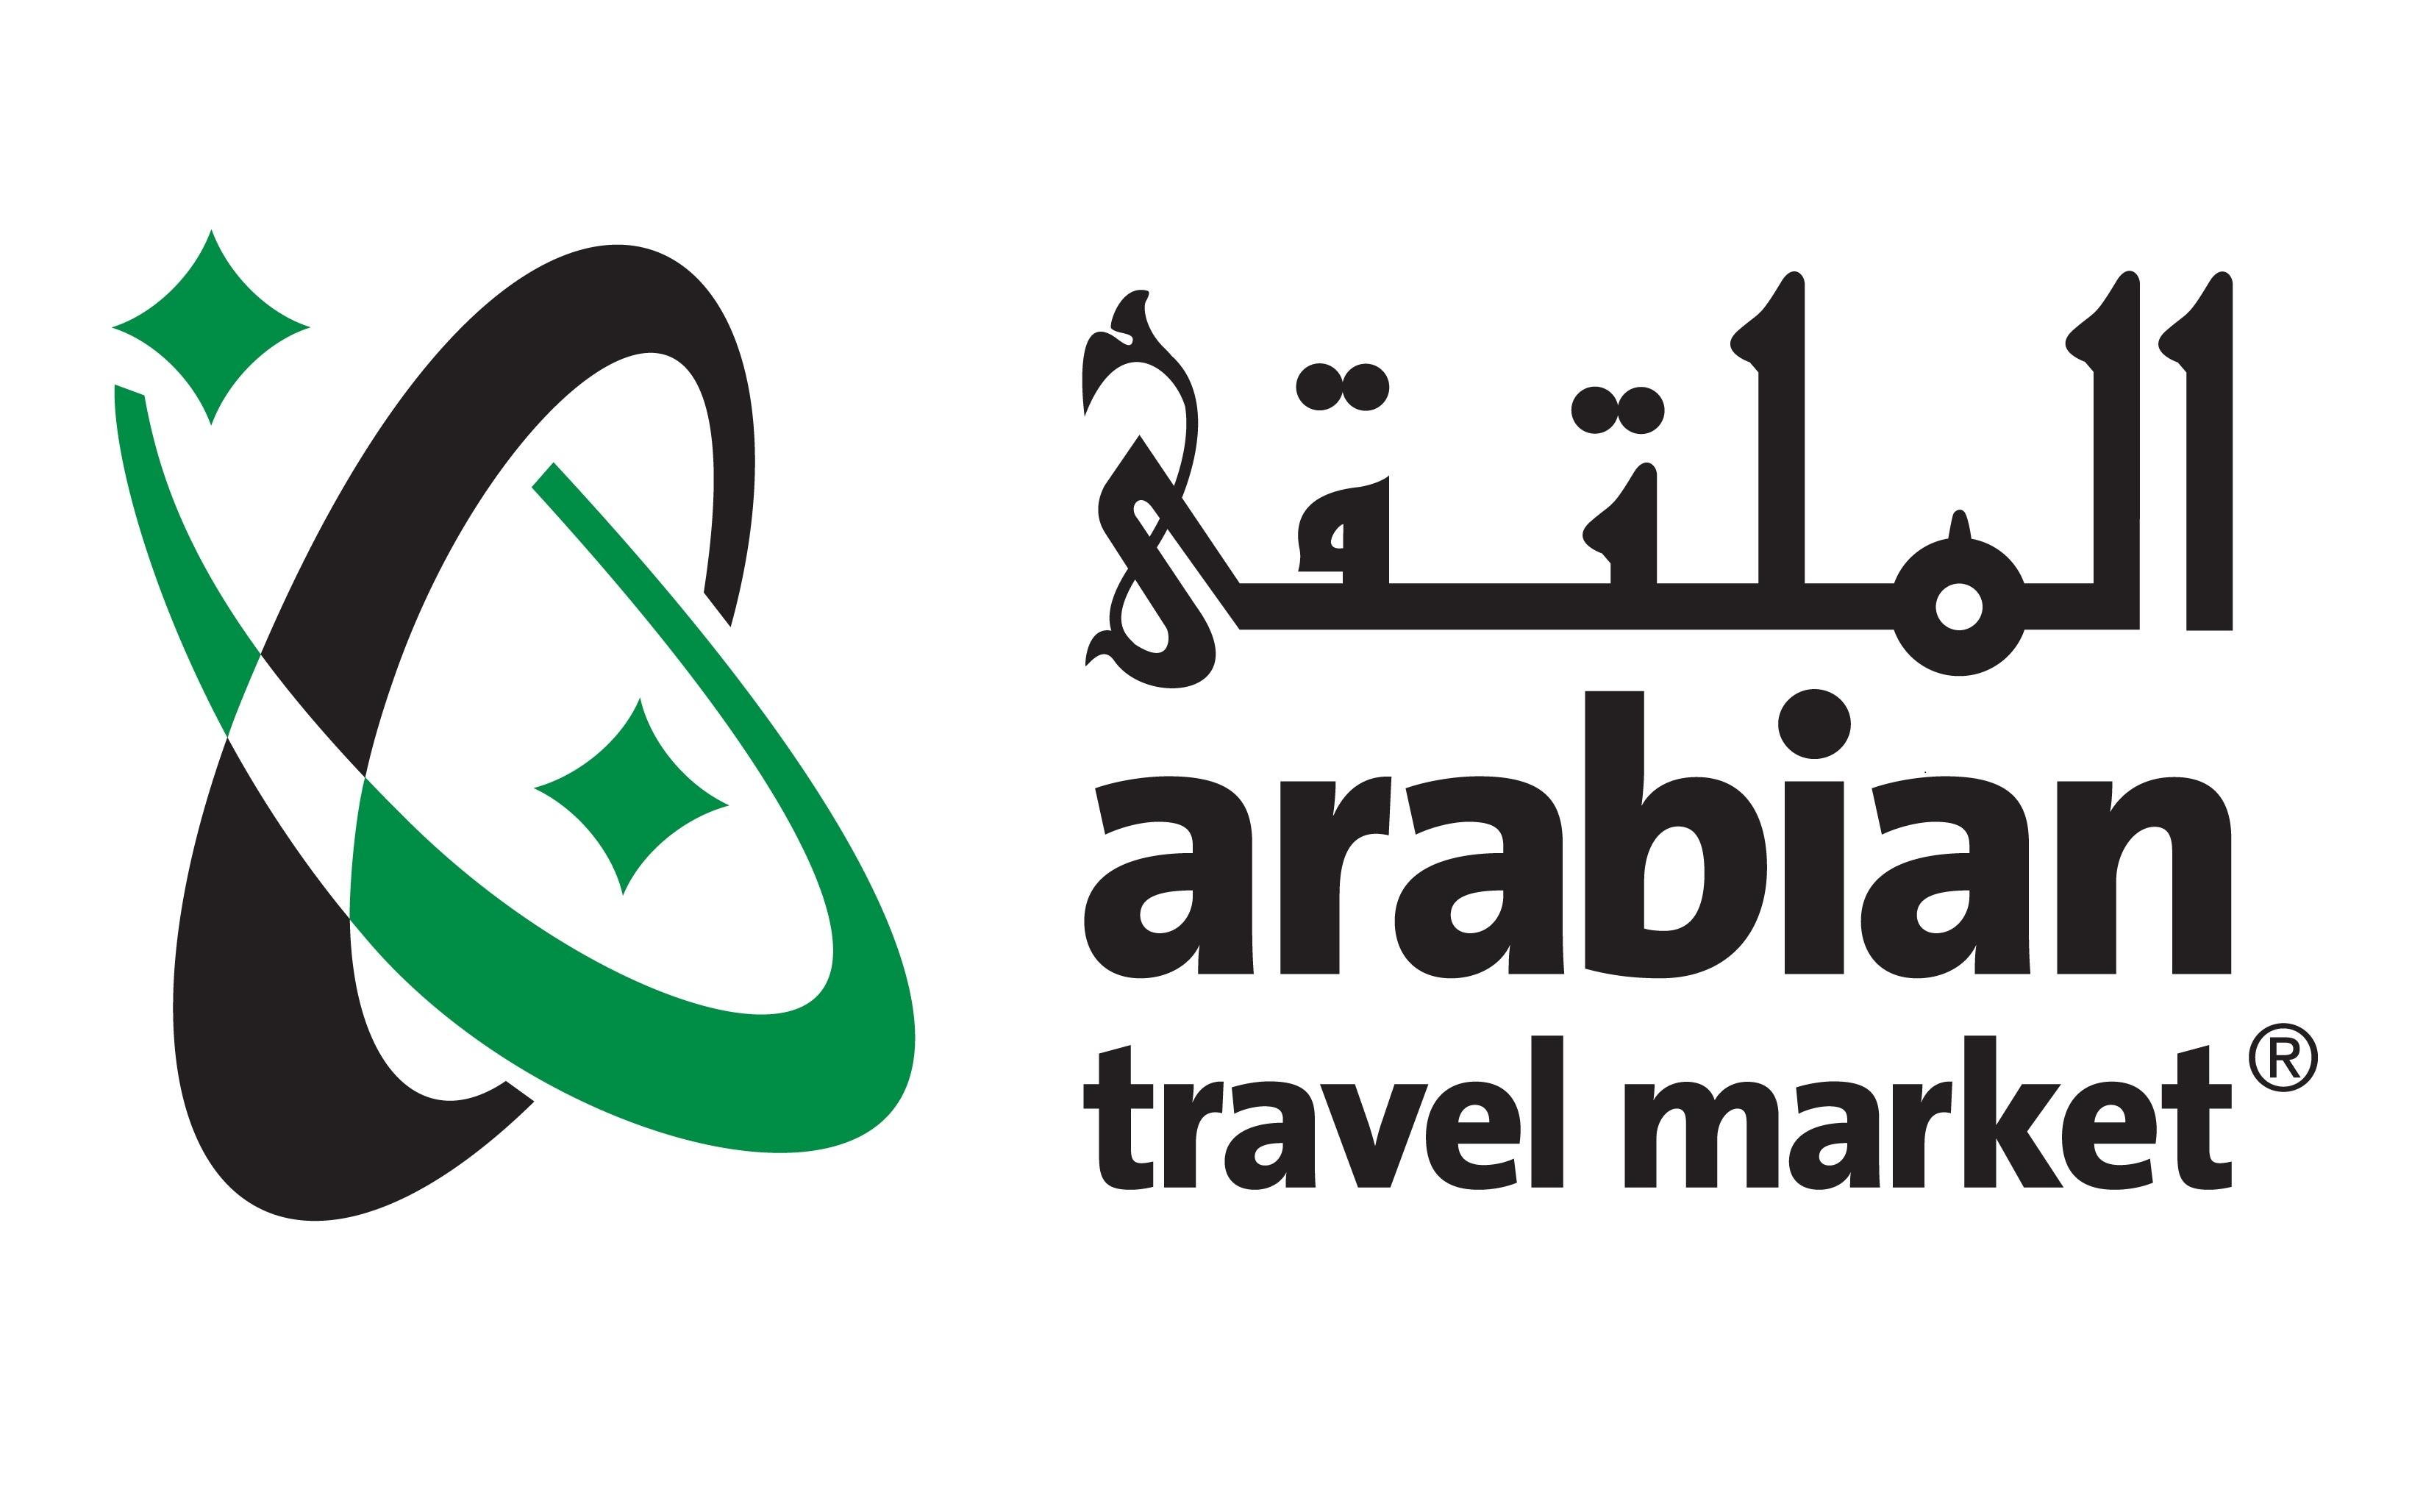 L'EMILIA ROMAGNA PRESENTA I SUOI TESORI TURISTICI ALL'ARABIAN TRAVEL MARKET DI DUBAI